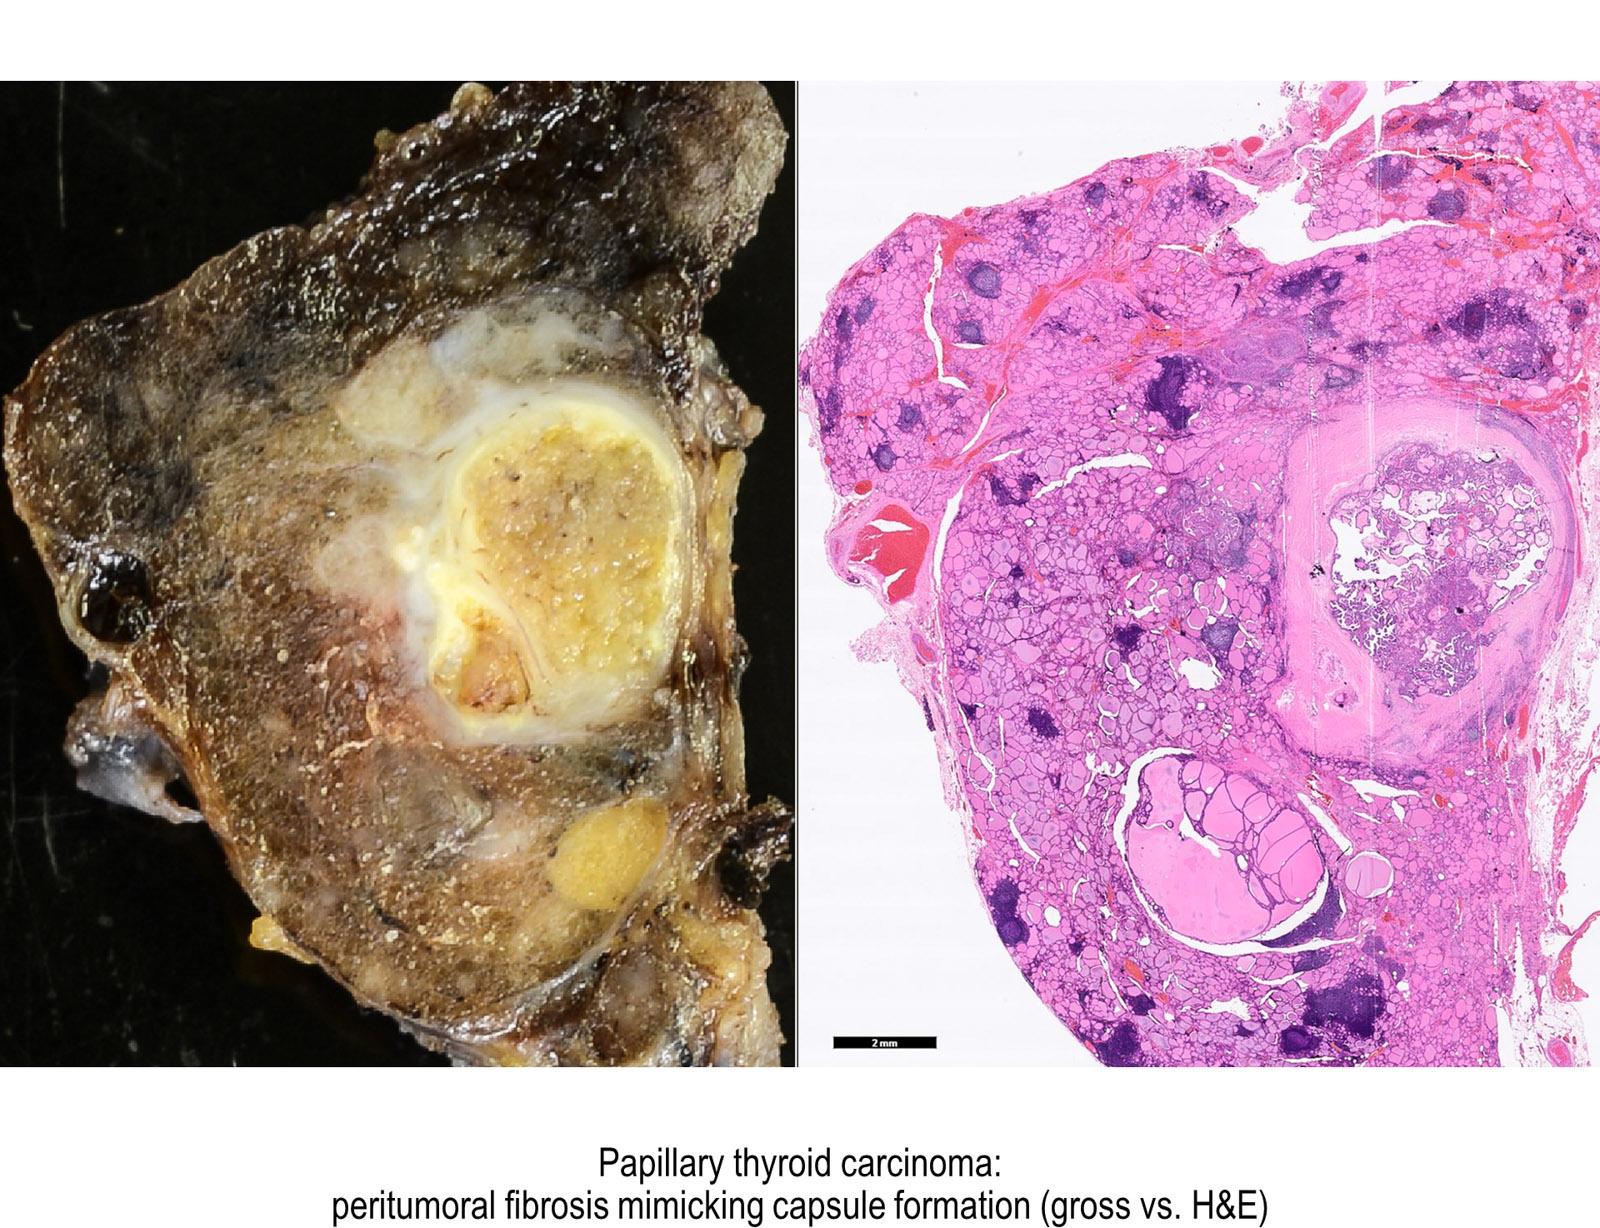 papillary thyroid cancer features